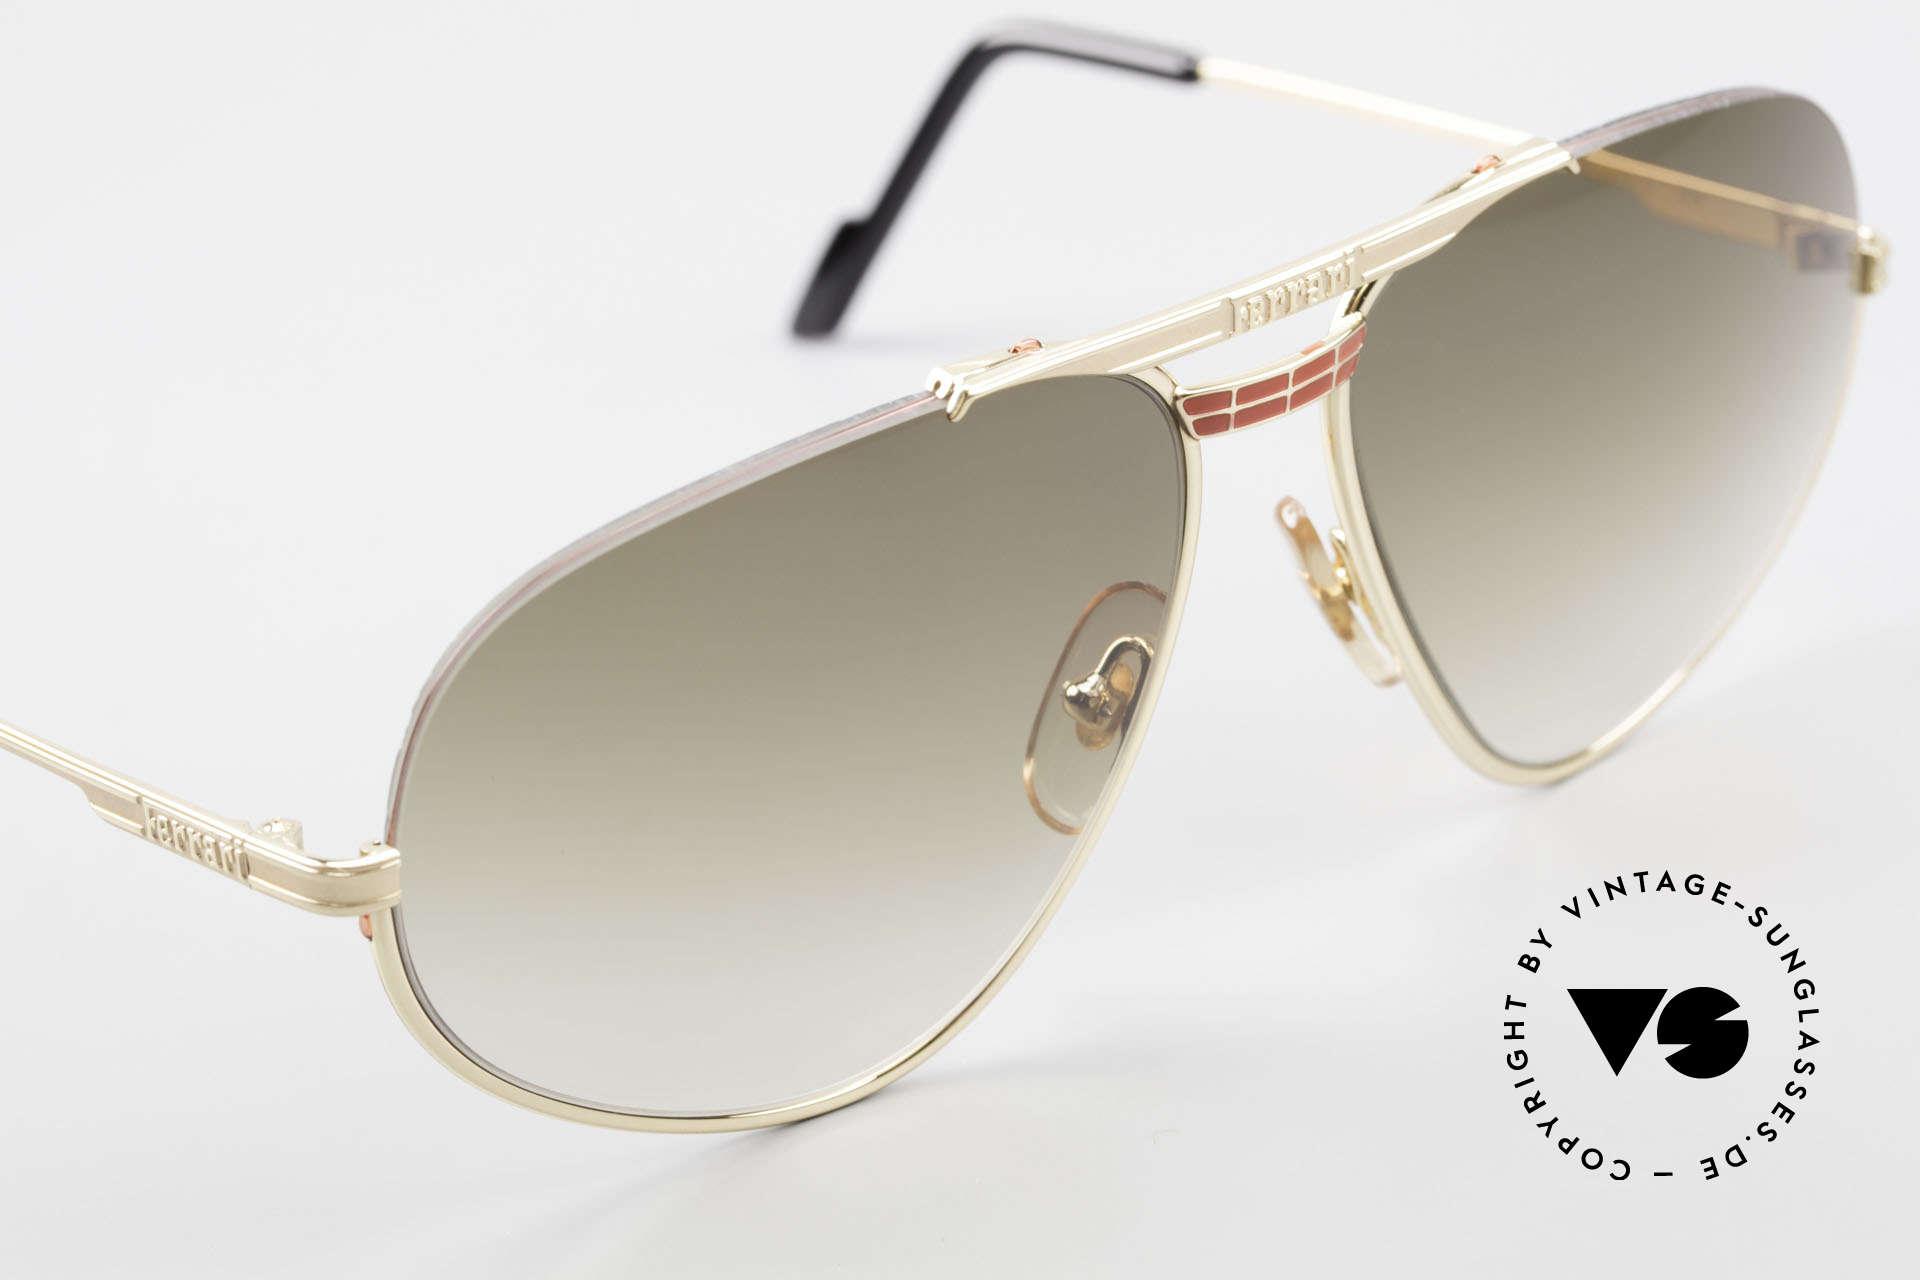 Ferrari F2 Ferrari Formula 1 Sunglasses, NO RETRO sunglasses, but a 30 years old ORIGINAL, Made for Men